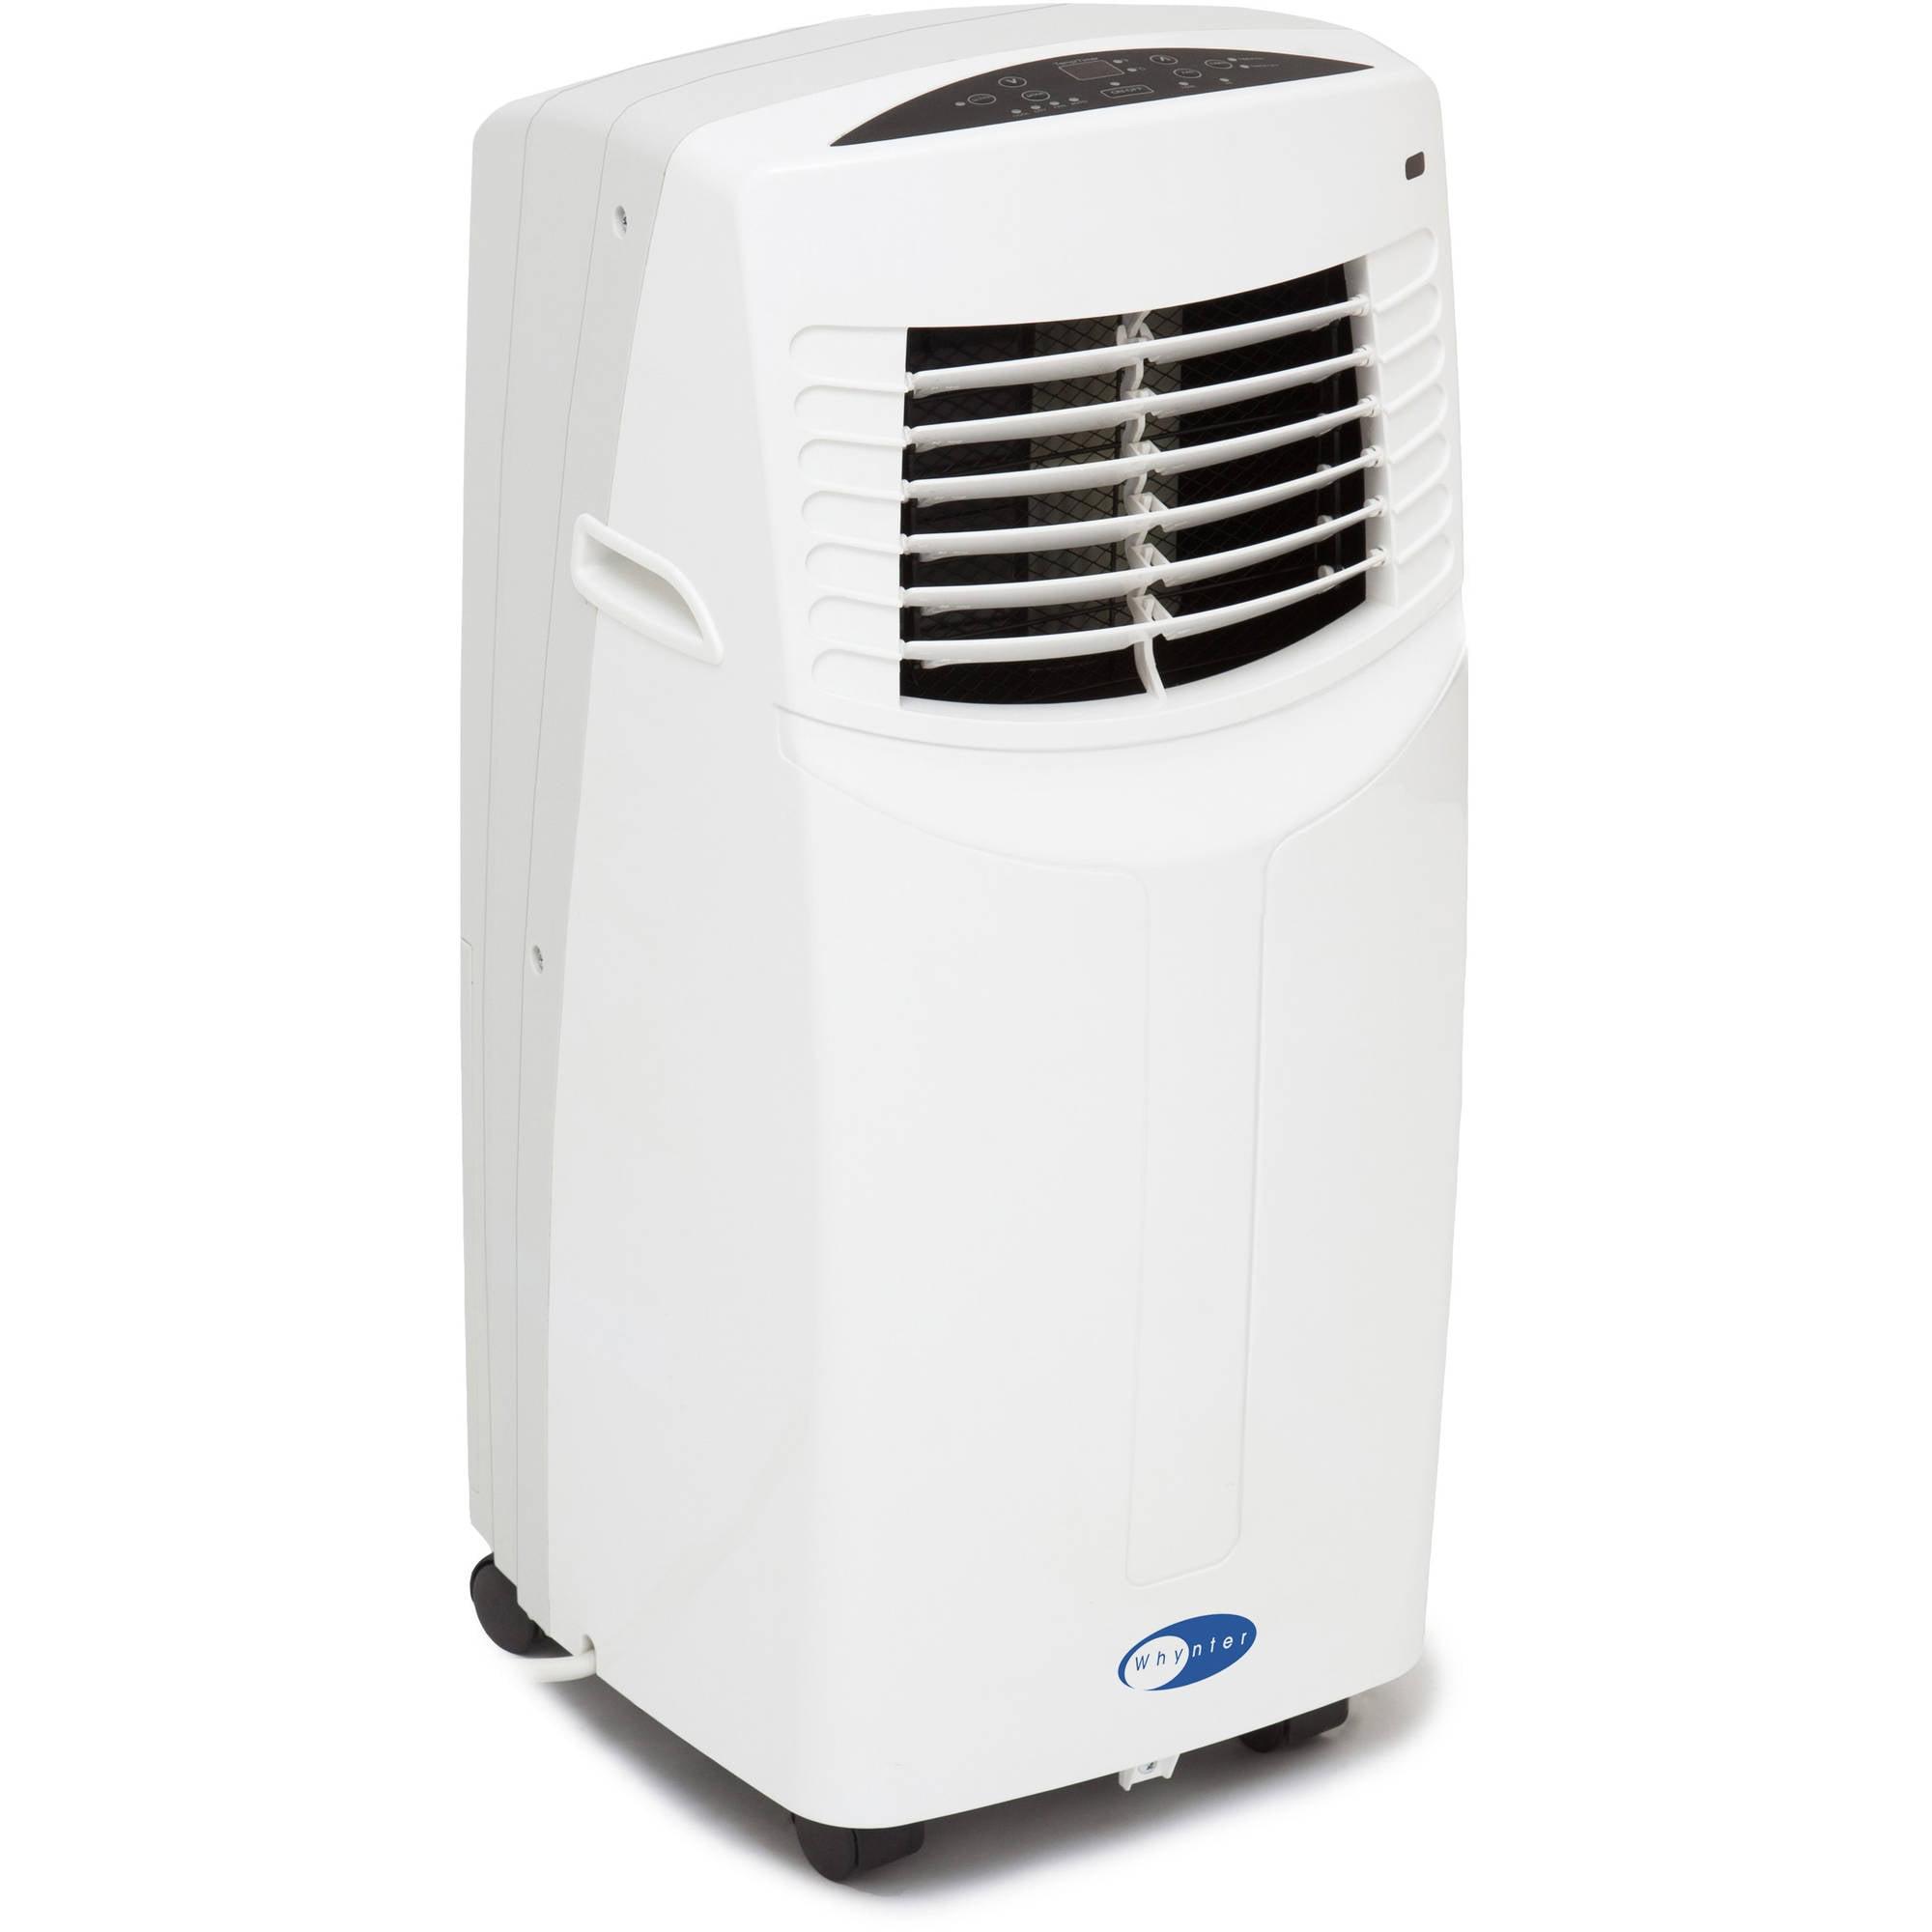 Whynter ARC 08WB Eco Friendly 8000 BTU Portable Air Conditioner